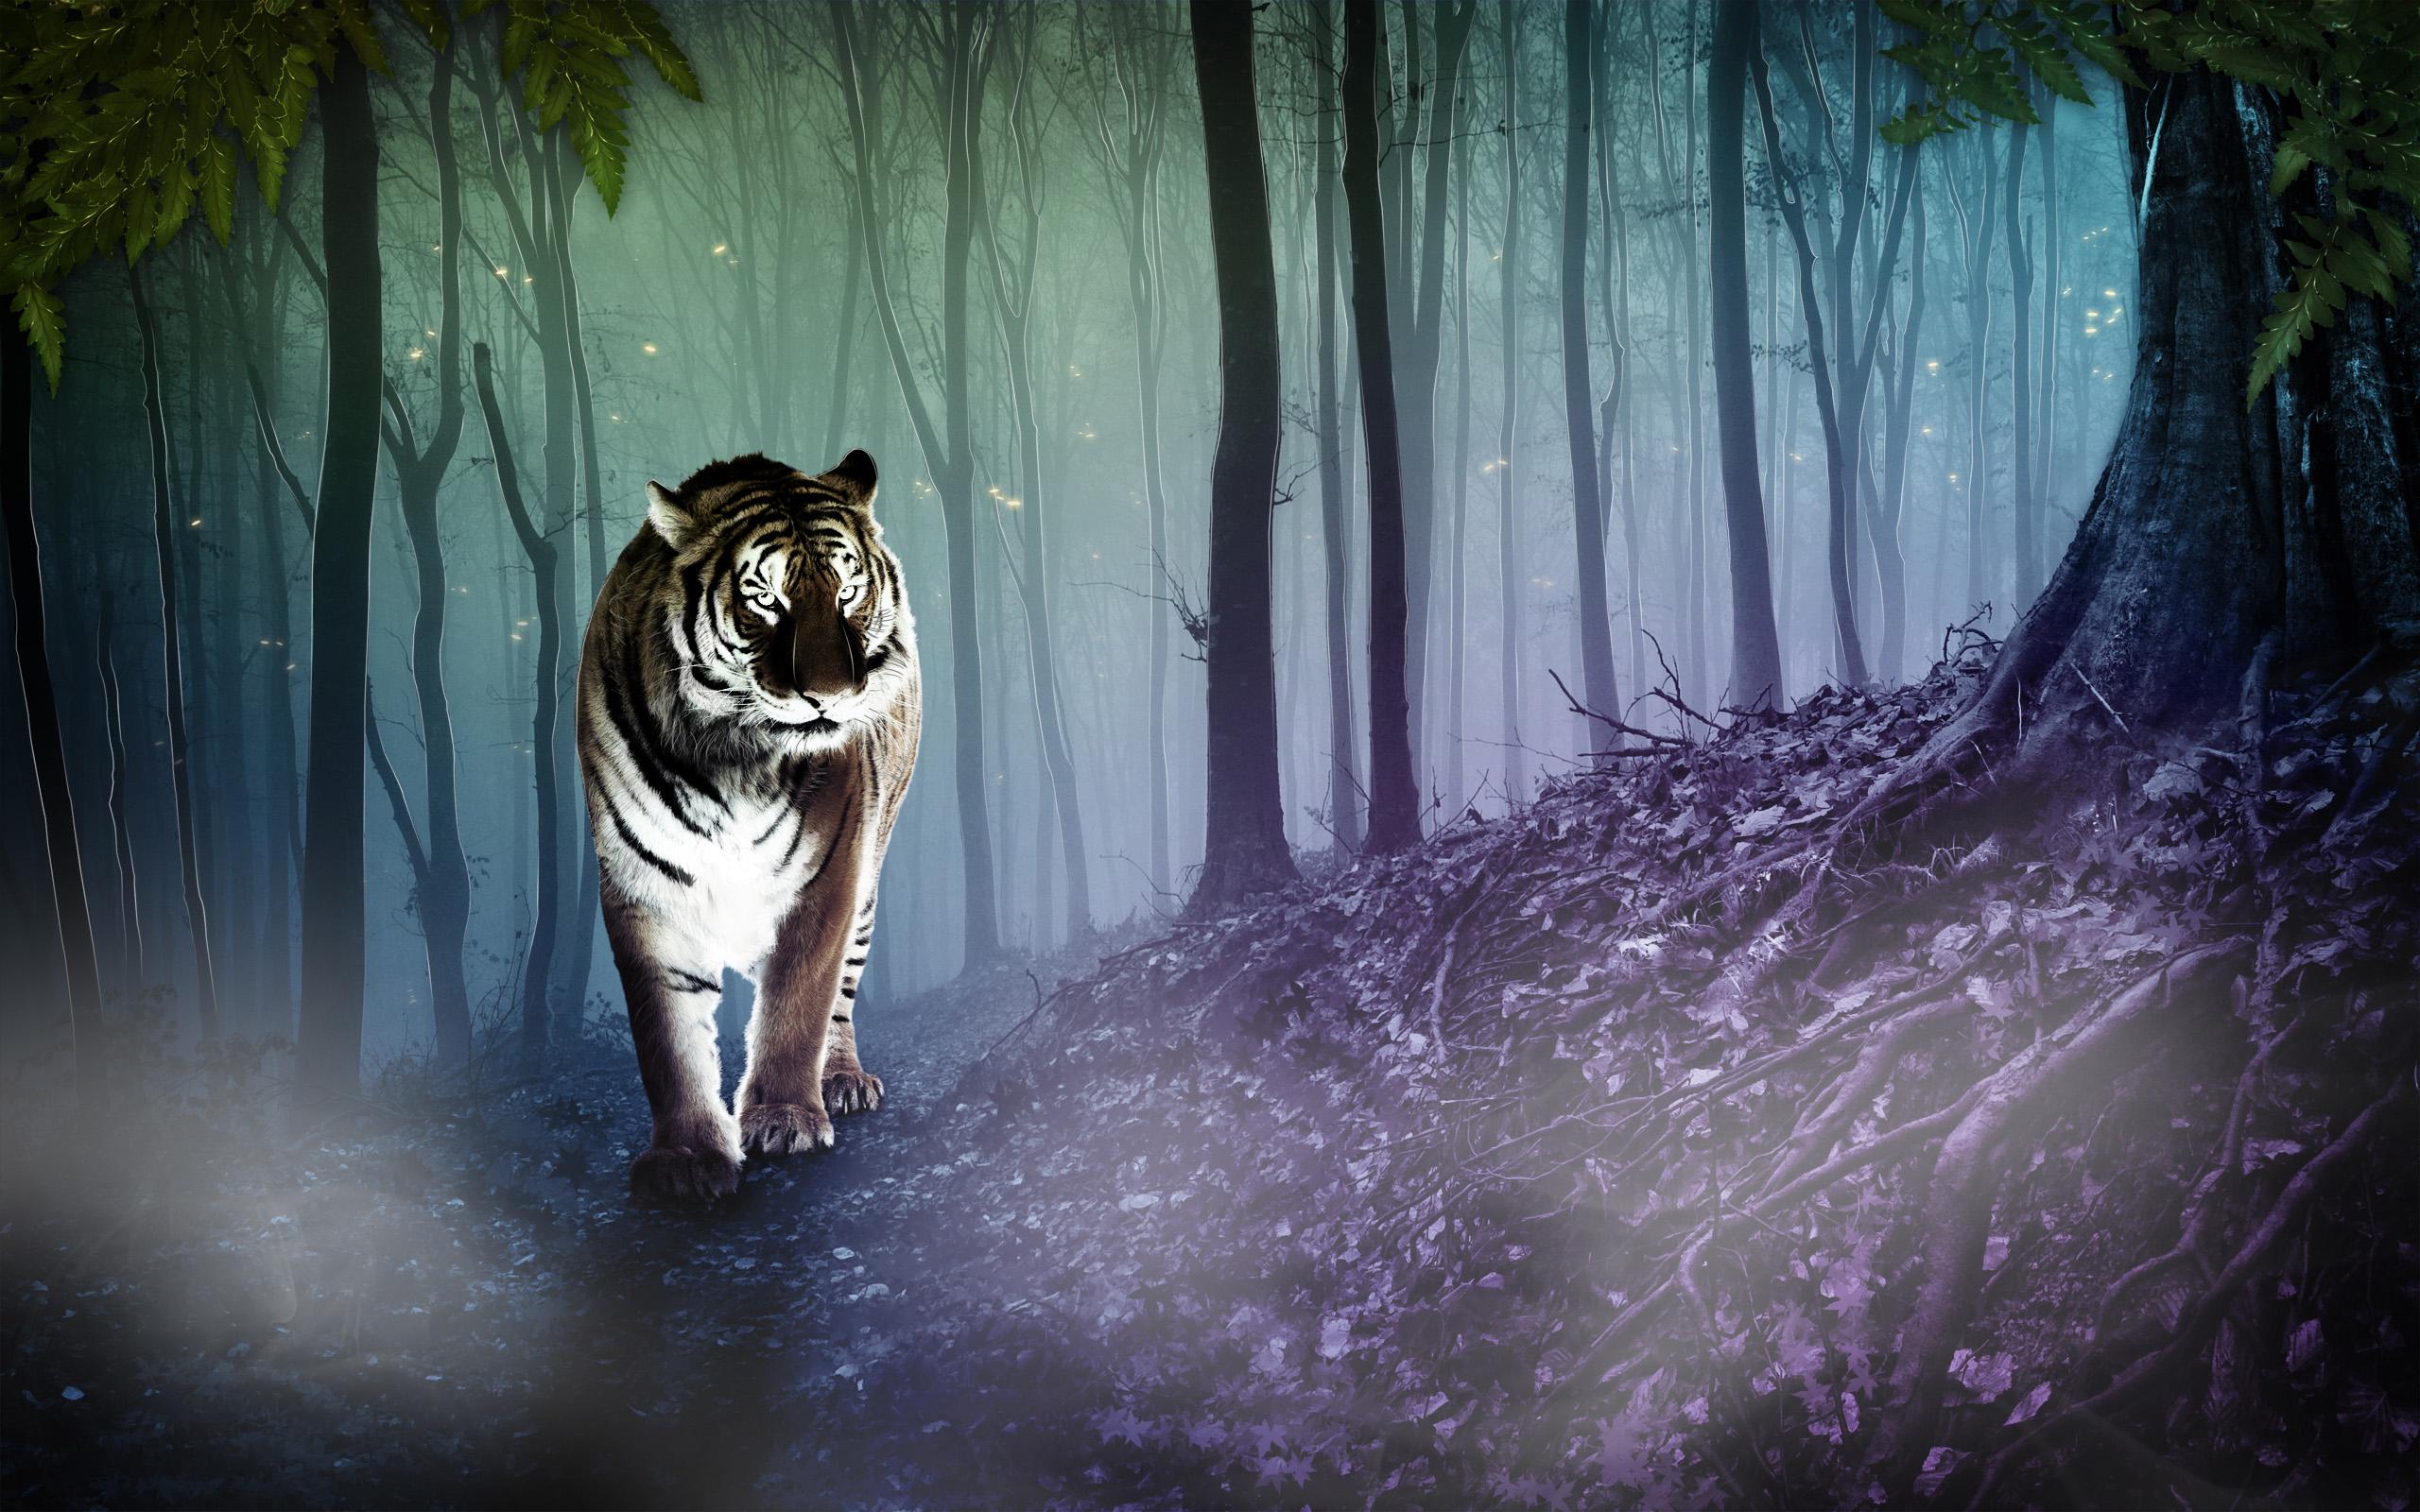 Artistic Tiger Computer Wallpapers, Desktop Backgrounds ...